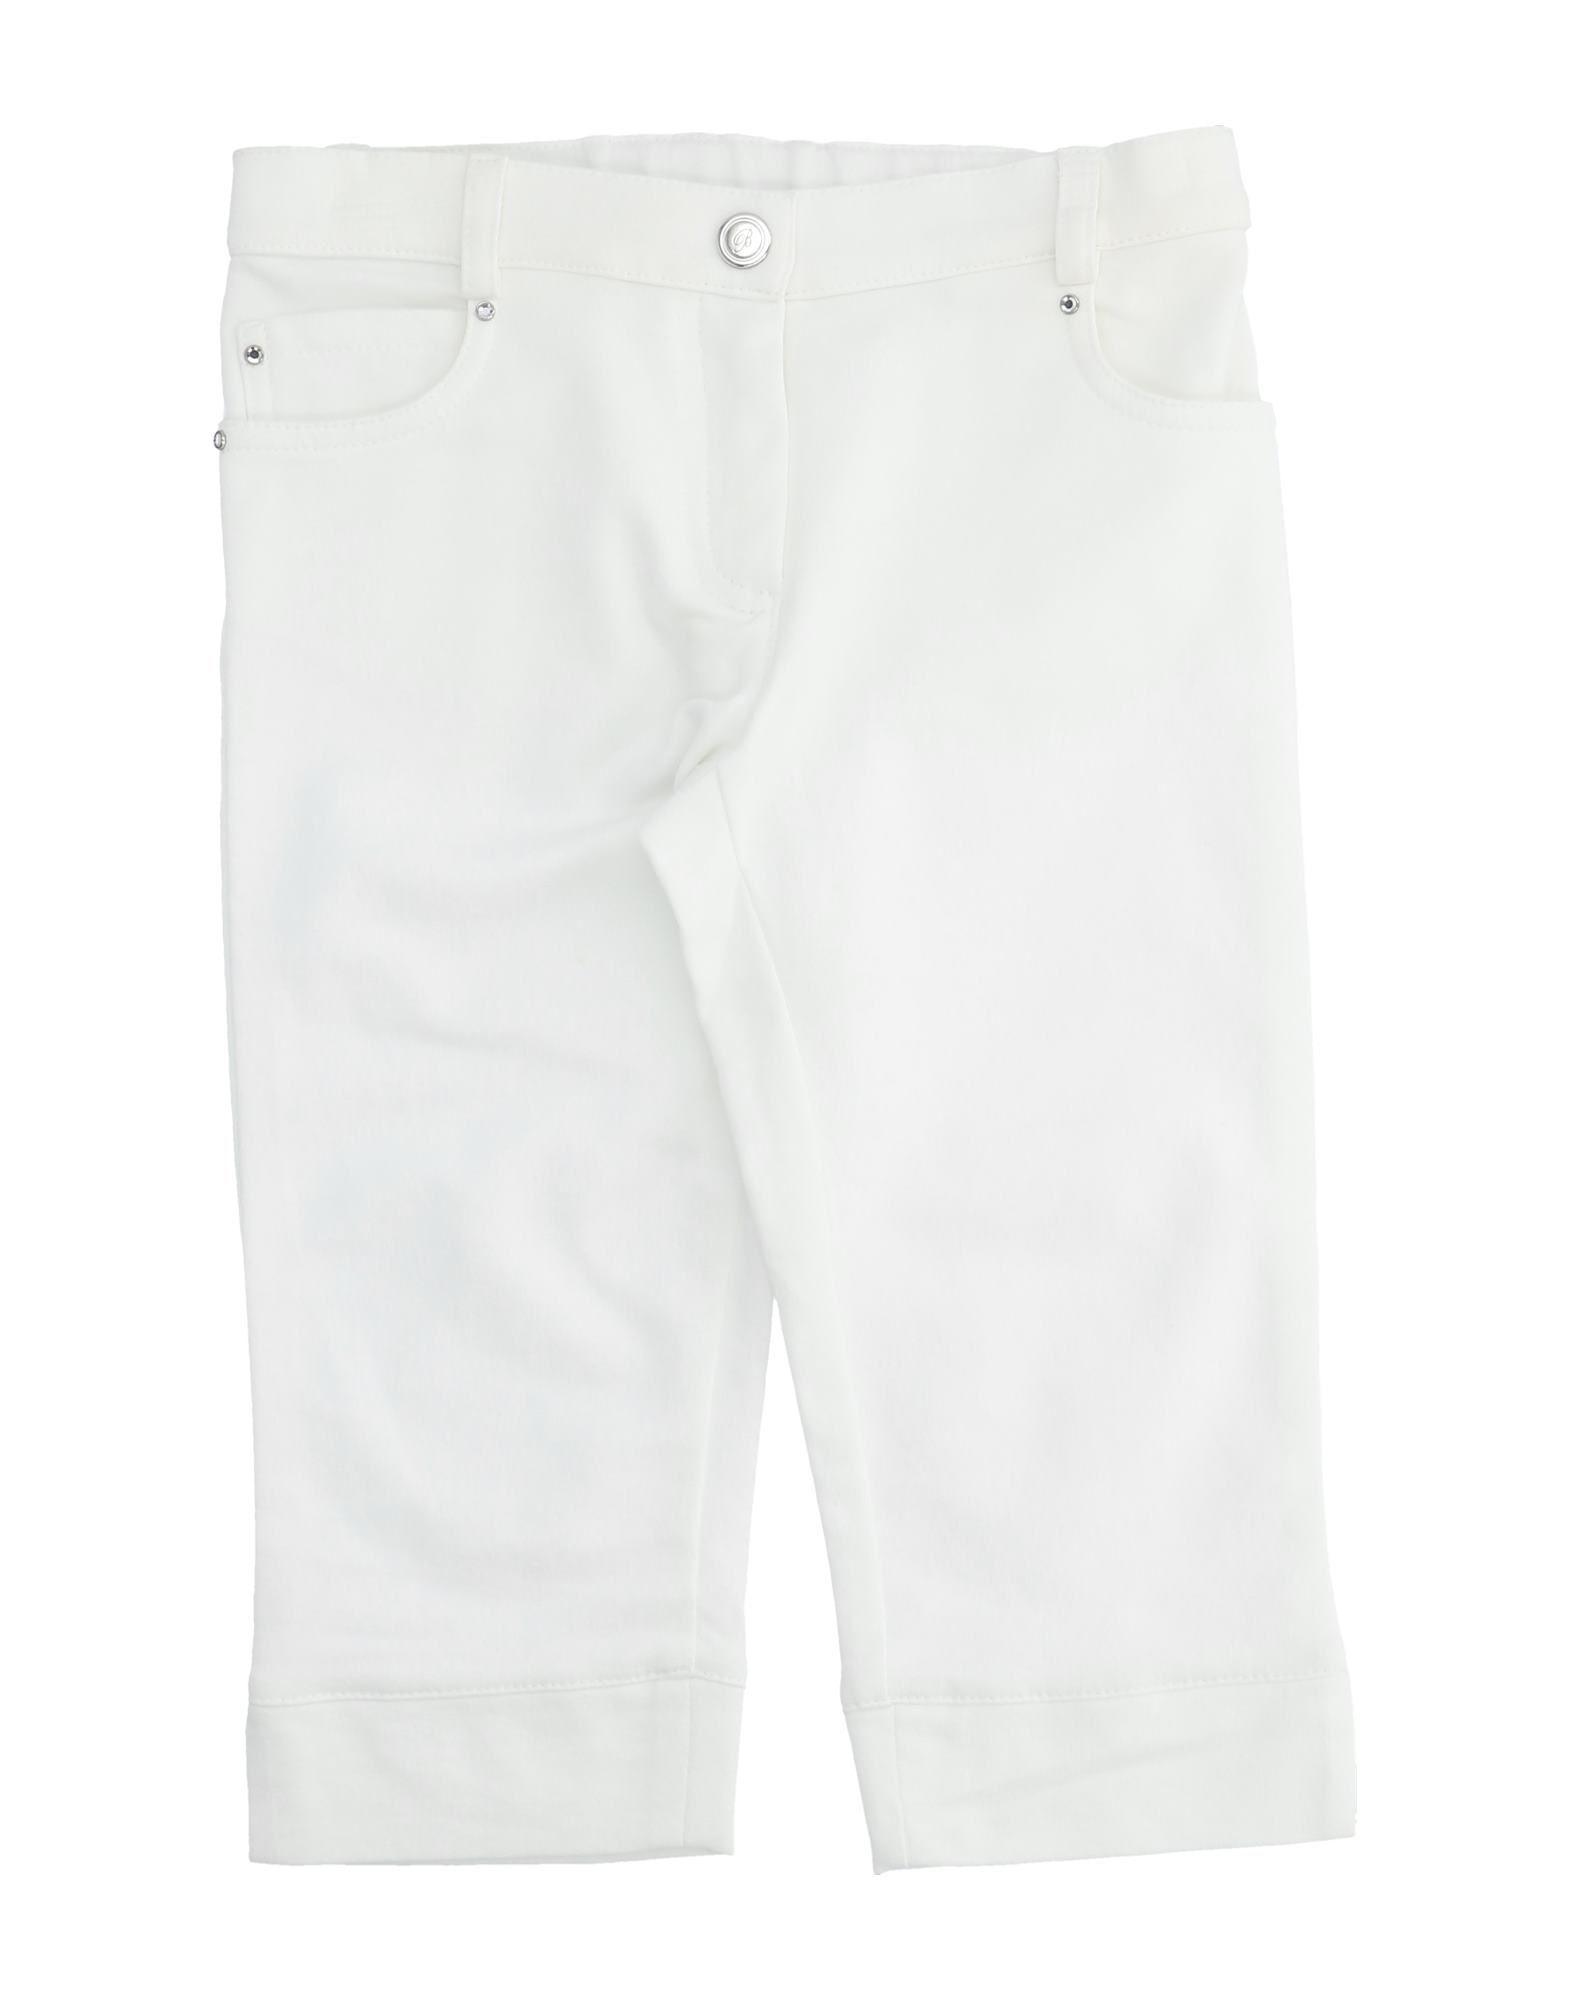 Miss Blumarine Kids' Casual Pants In White